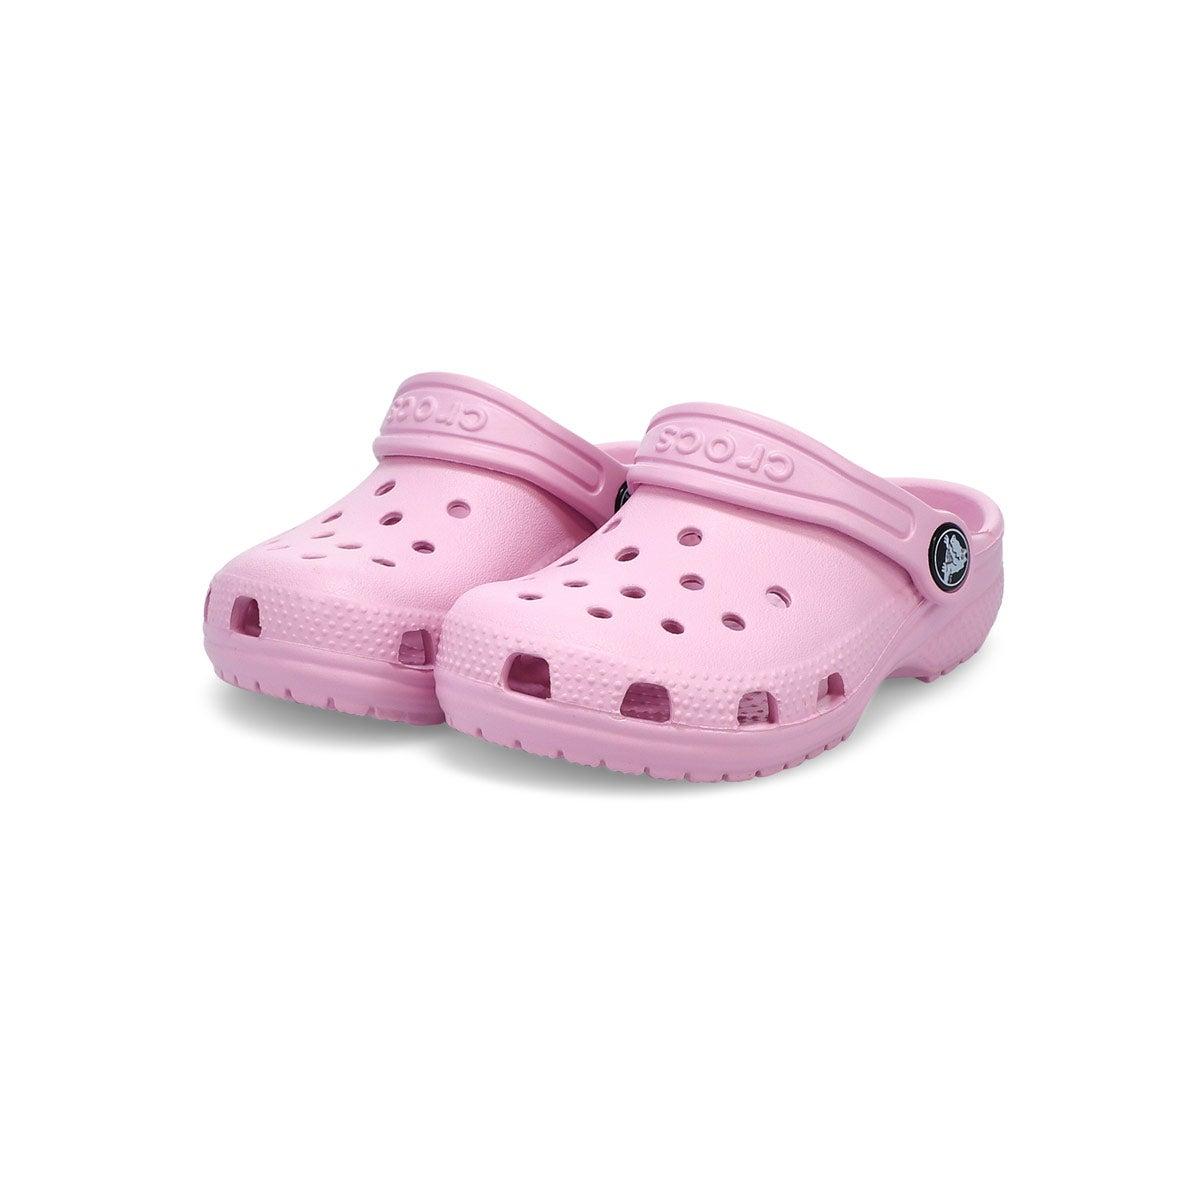 Sabot confort EVA CLASSIC,rose, bébés